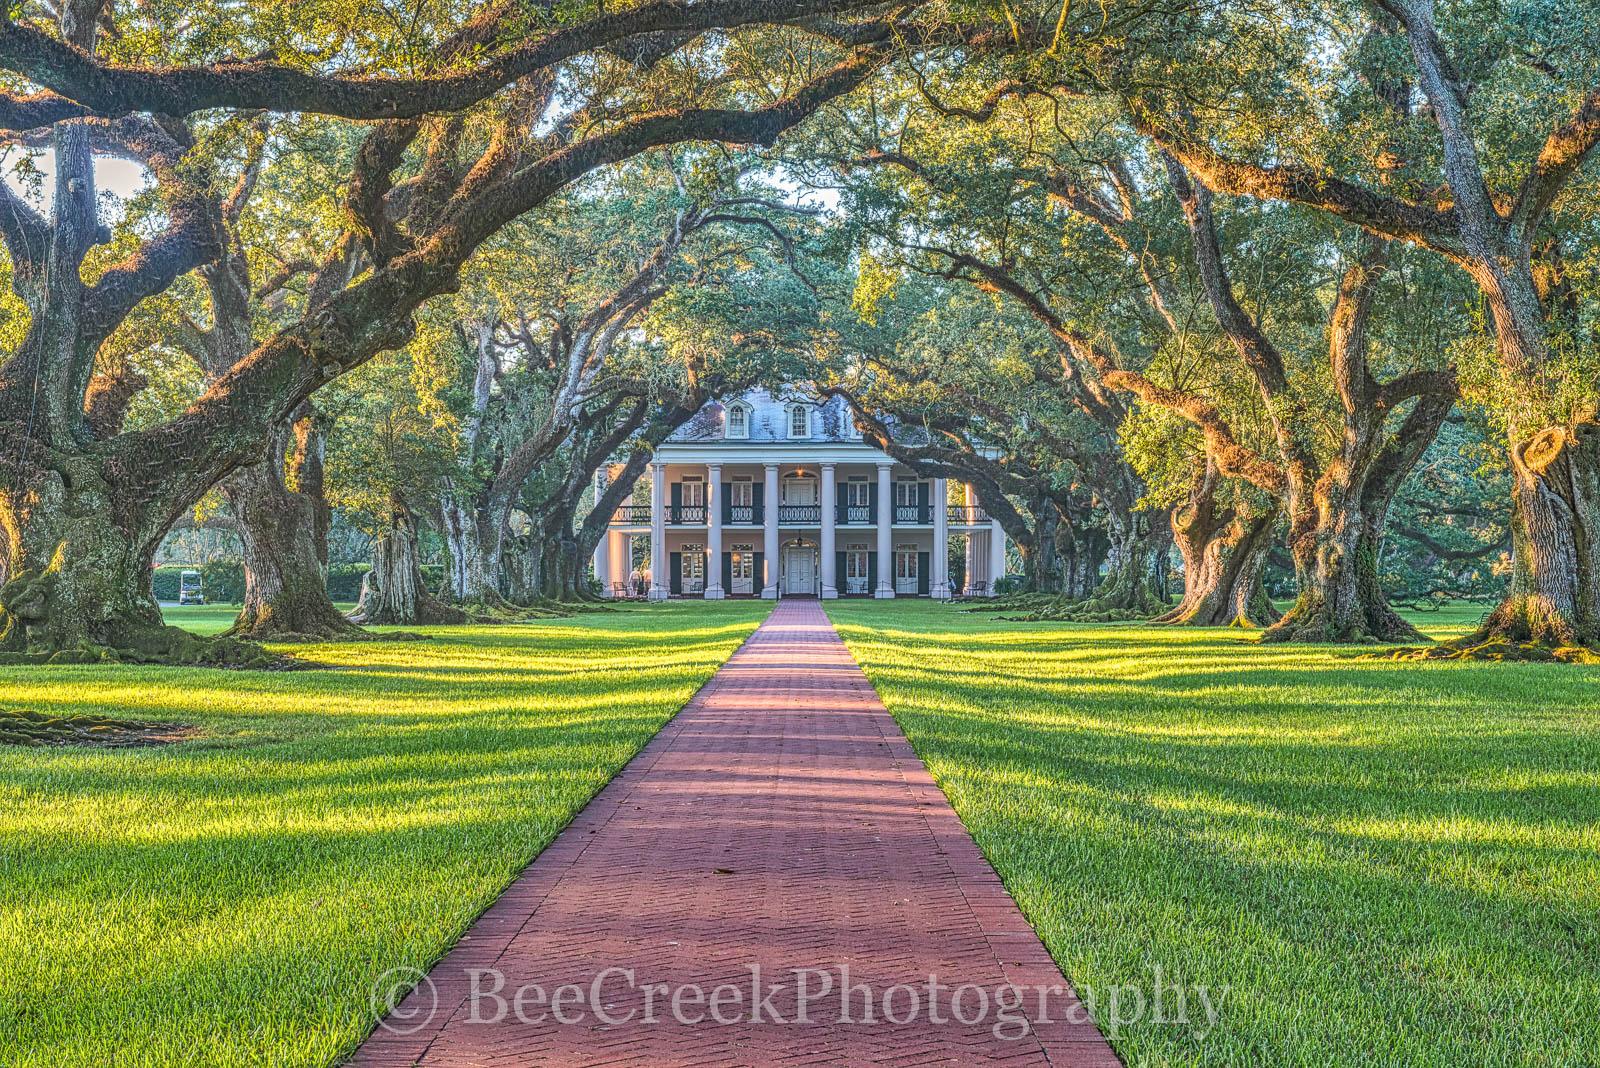 Louisiana, National Historic Landmark, Oak Alley, Sunrise, big house, branches, canopy, history, landmark, limbs, mansion, Mississippi, oak trees, plantation, sidewalk, slaves, sugar cane